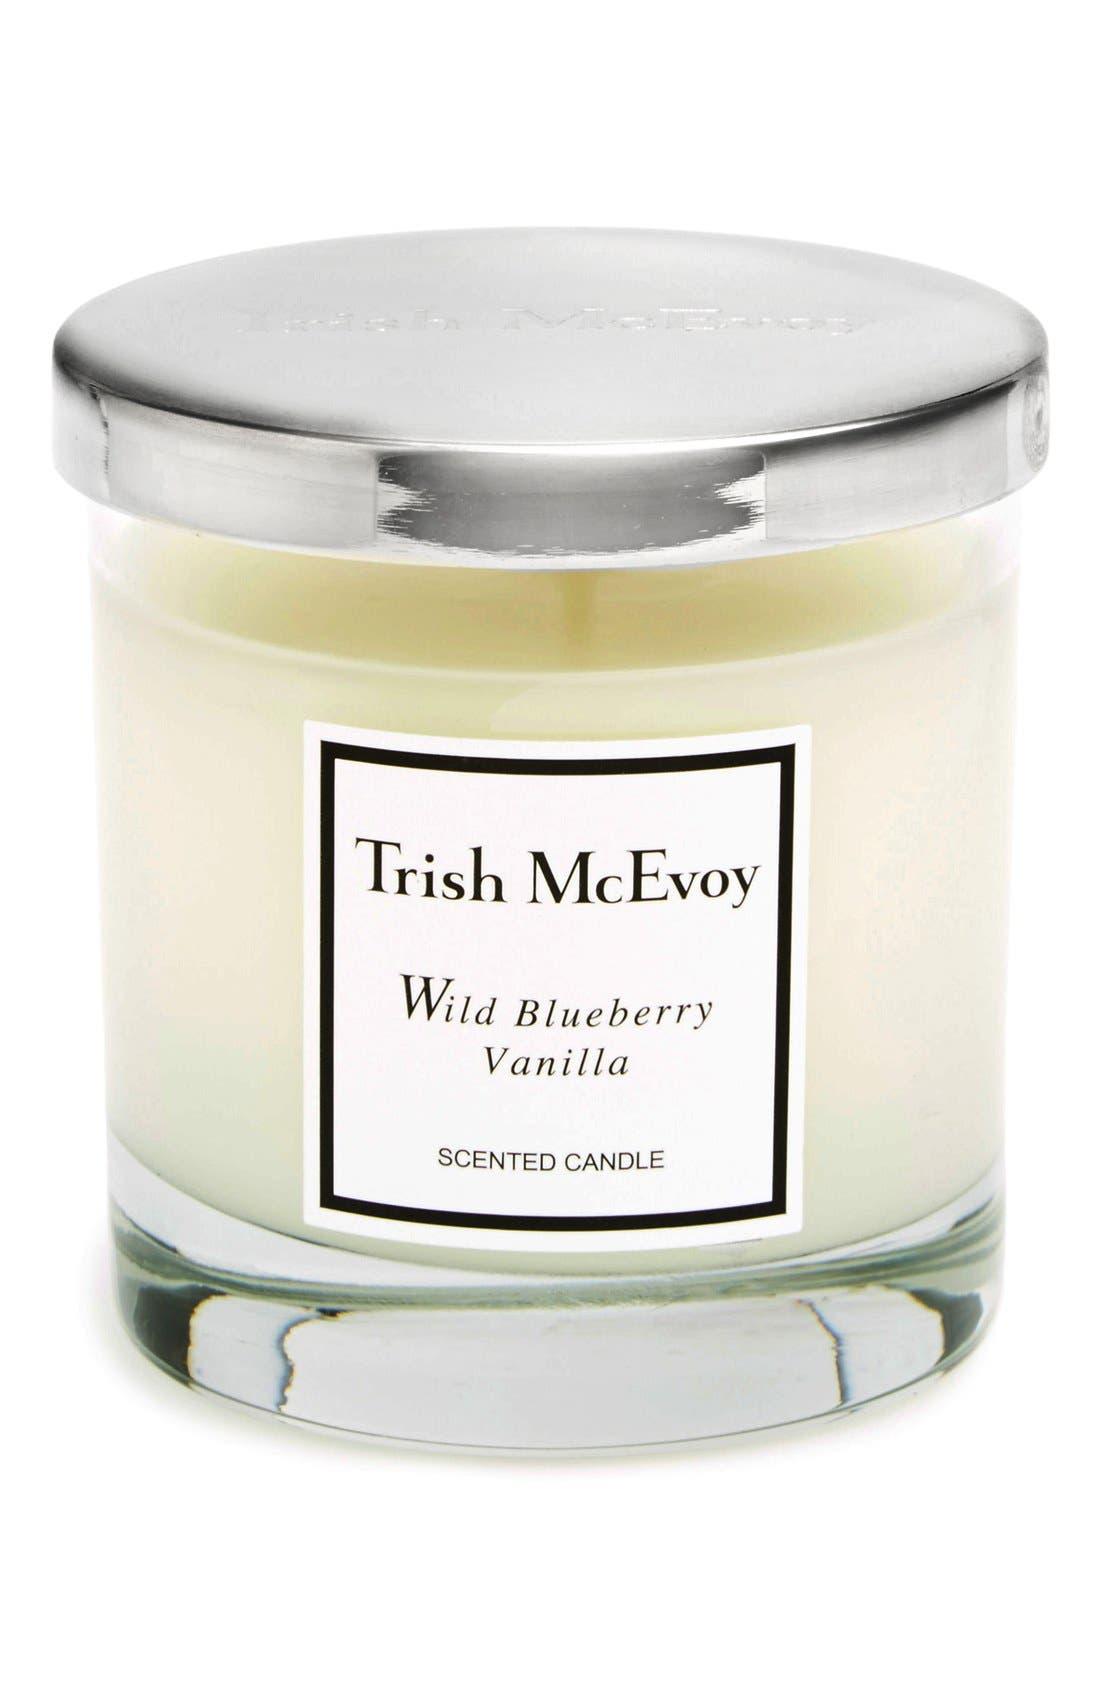 Trish McEvoy 'Wild Blueberry Vanilla' Candle